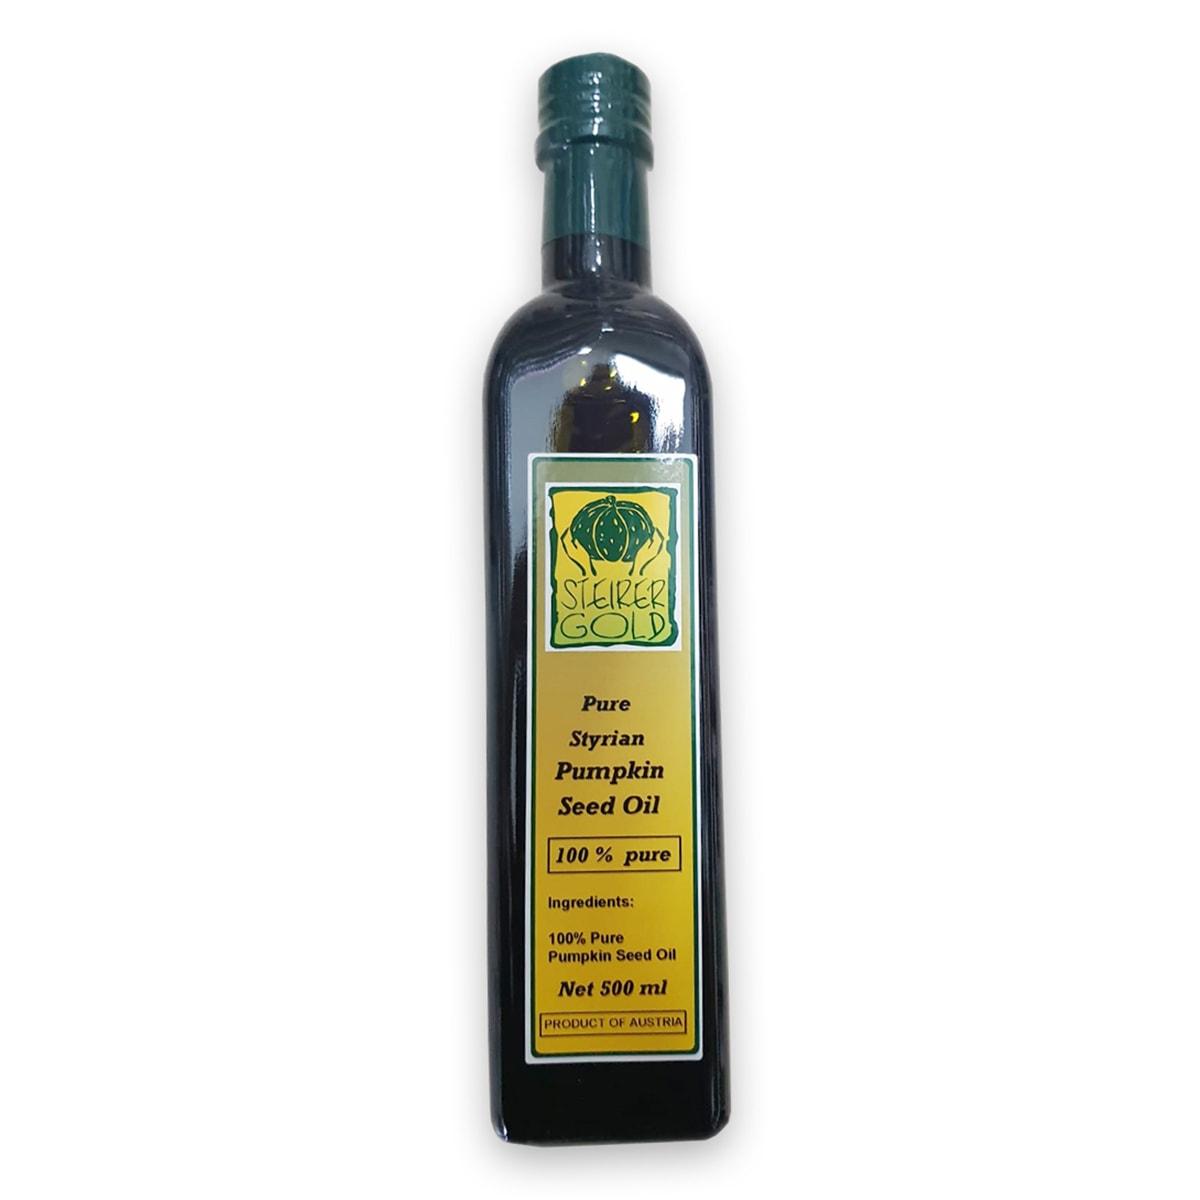 Pure Styrian Pumpkin Seed Oil - 500 ml